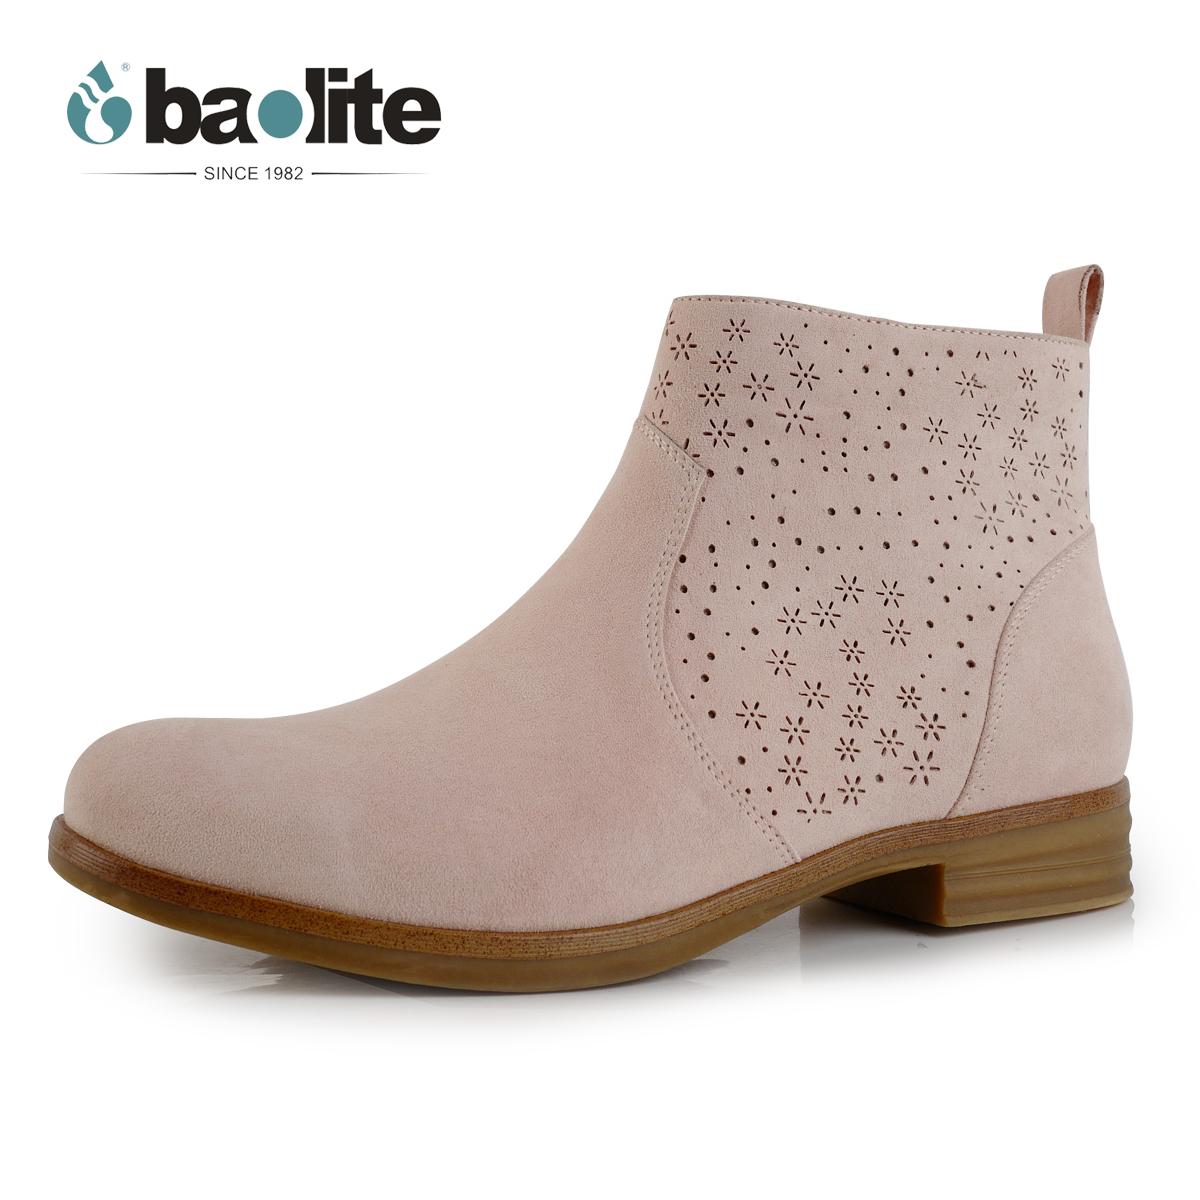 7462ac7798875 Baolite الأوروبية بسيطة الجوف خارج المرأة أحذية السيدات الأحذية